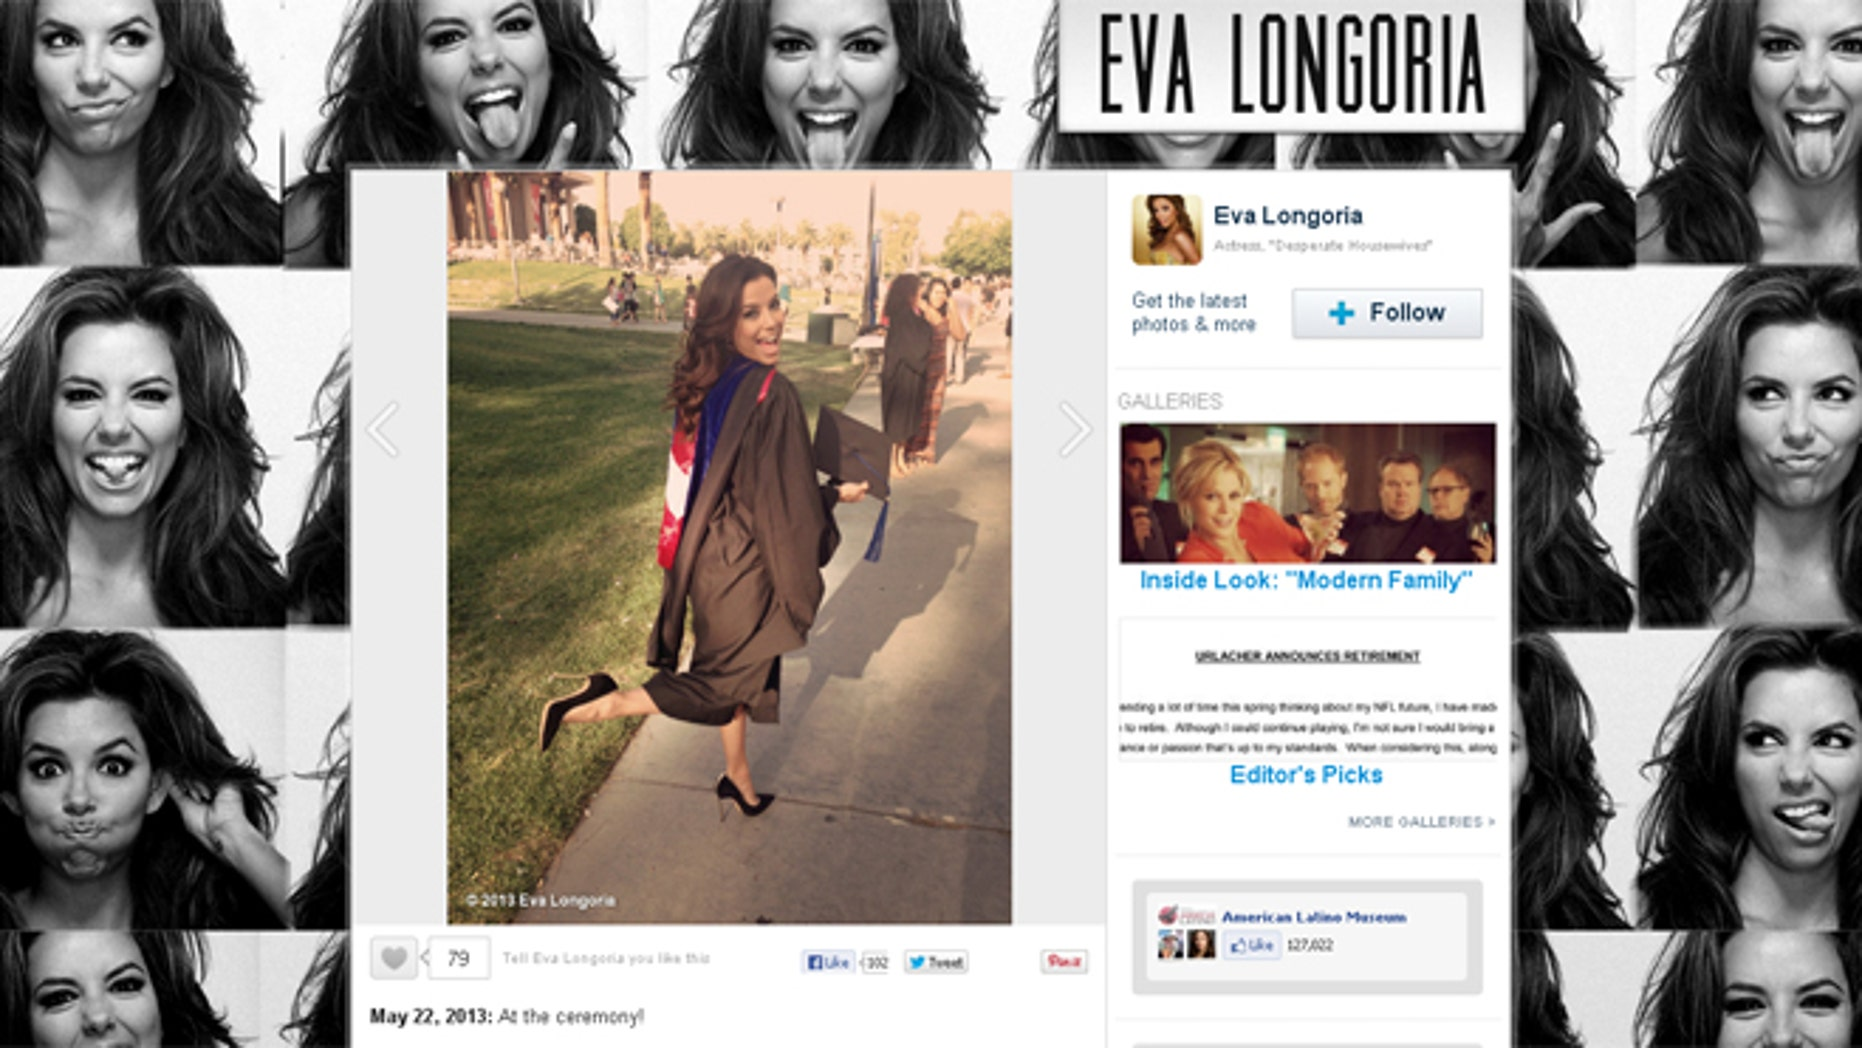 Eva Longoria's WhoSay.com posing after her graduation on Saturday.